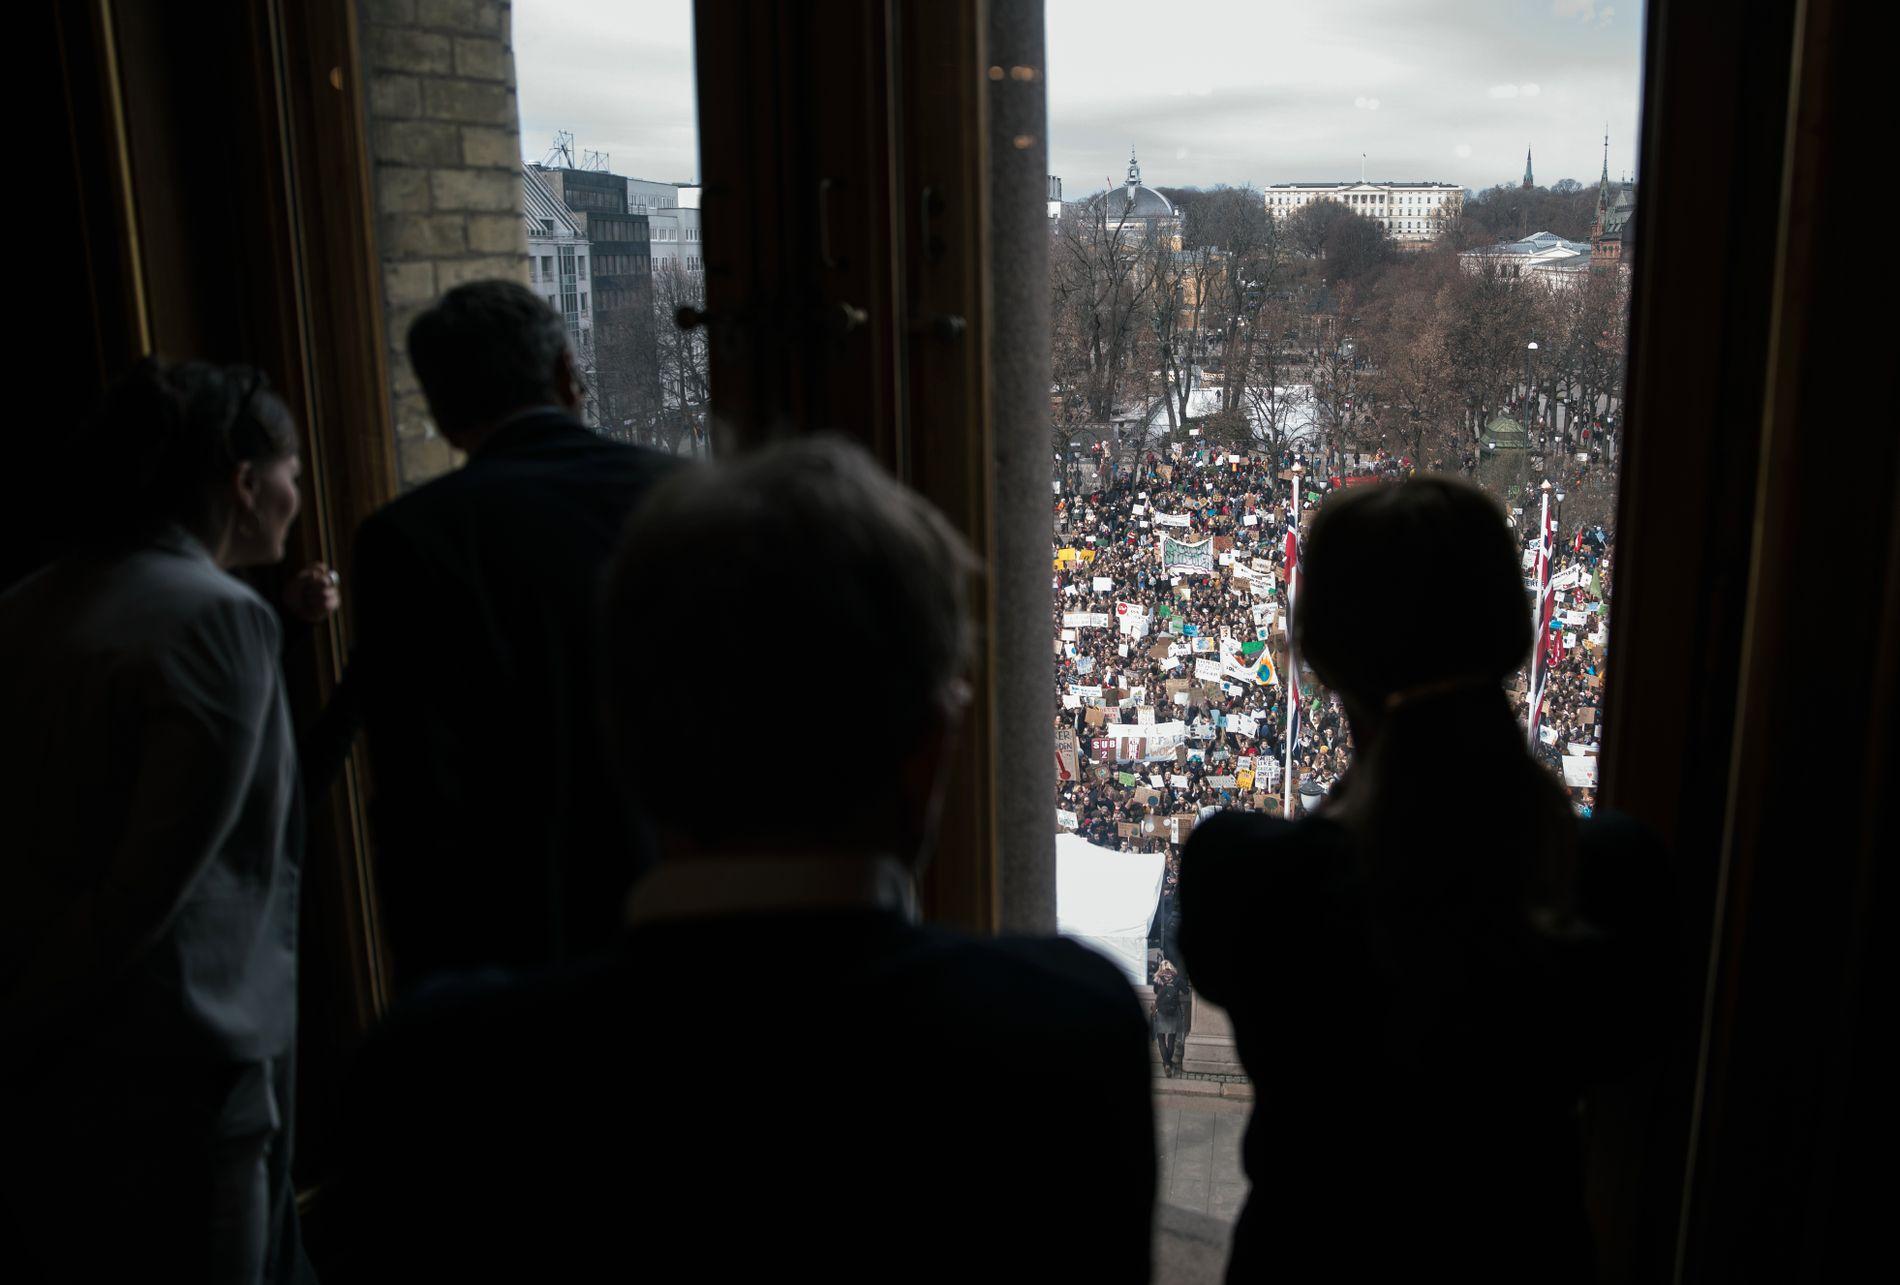 DIPLOM: Innenfra Stortingssalen følges det med på at skoleungdom streiker for klimaet og demonstrerer foran Stortinget i Oslo.